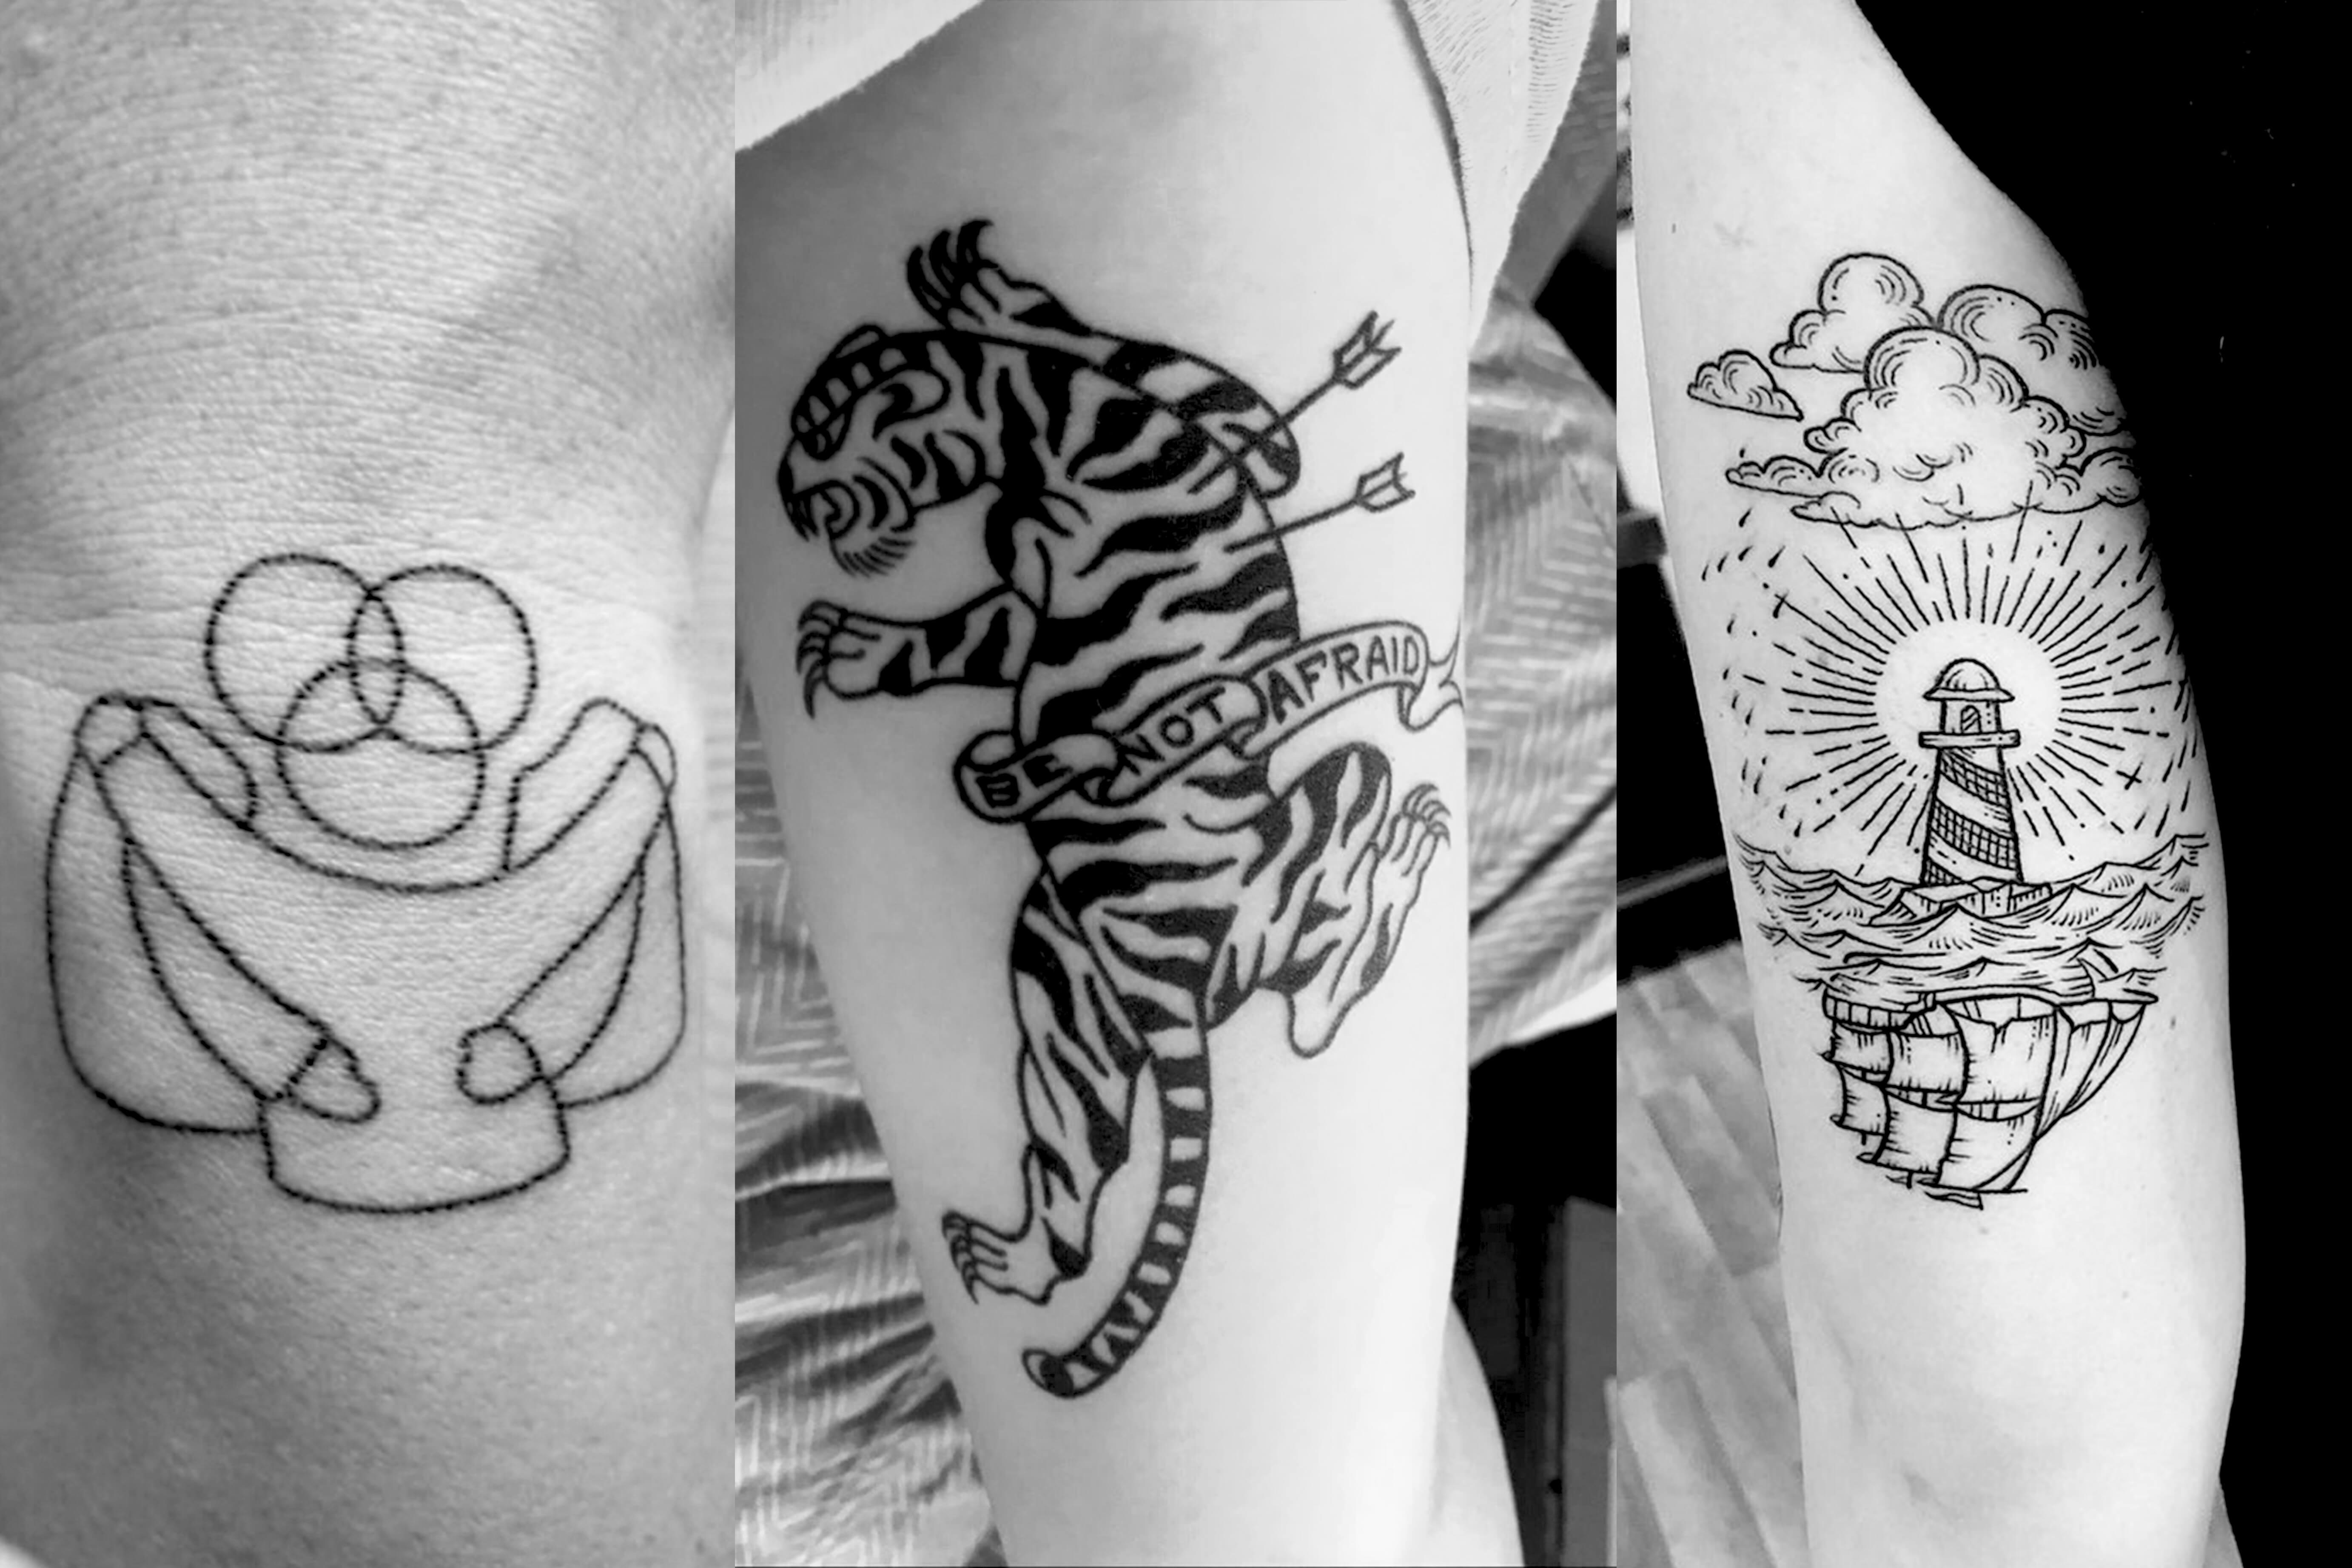 Three images of tattoos inspired by Scott Erickson Art.